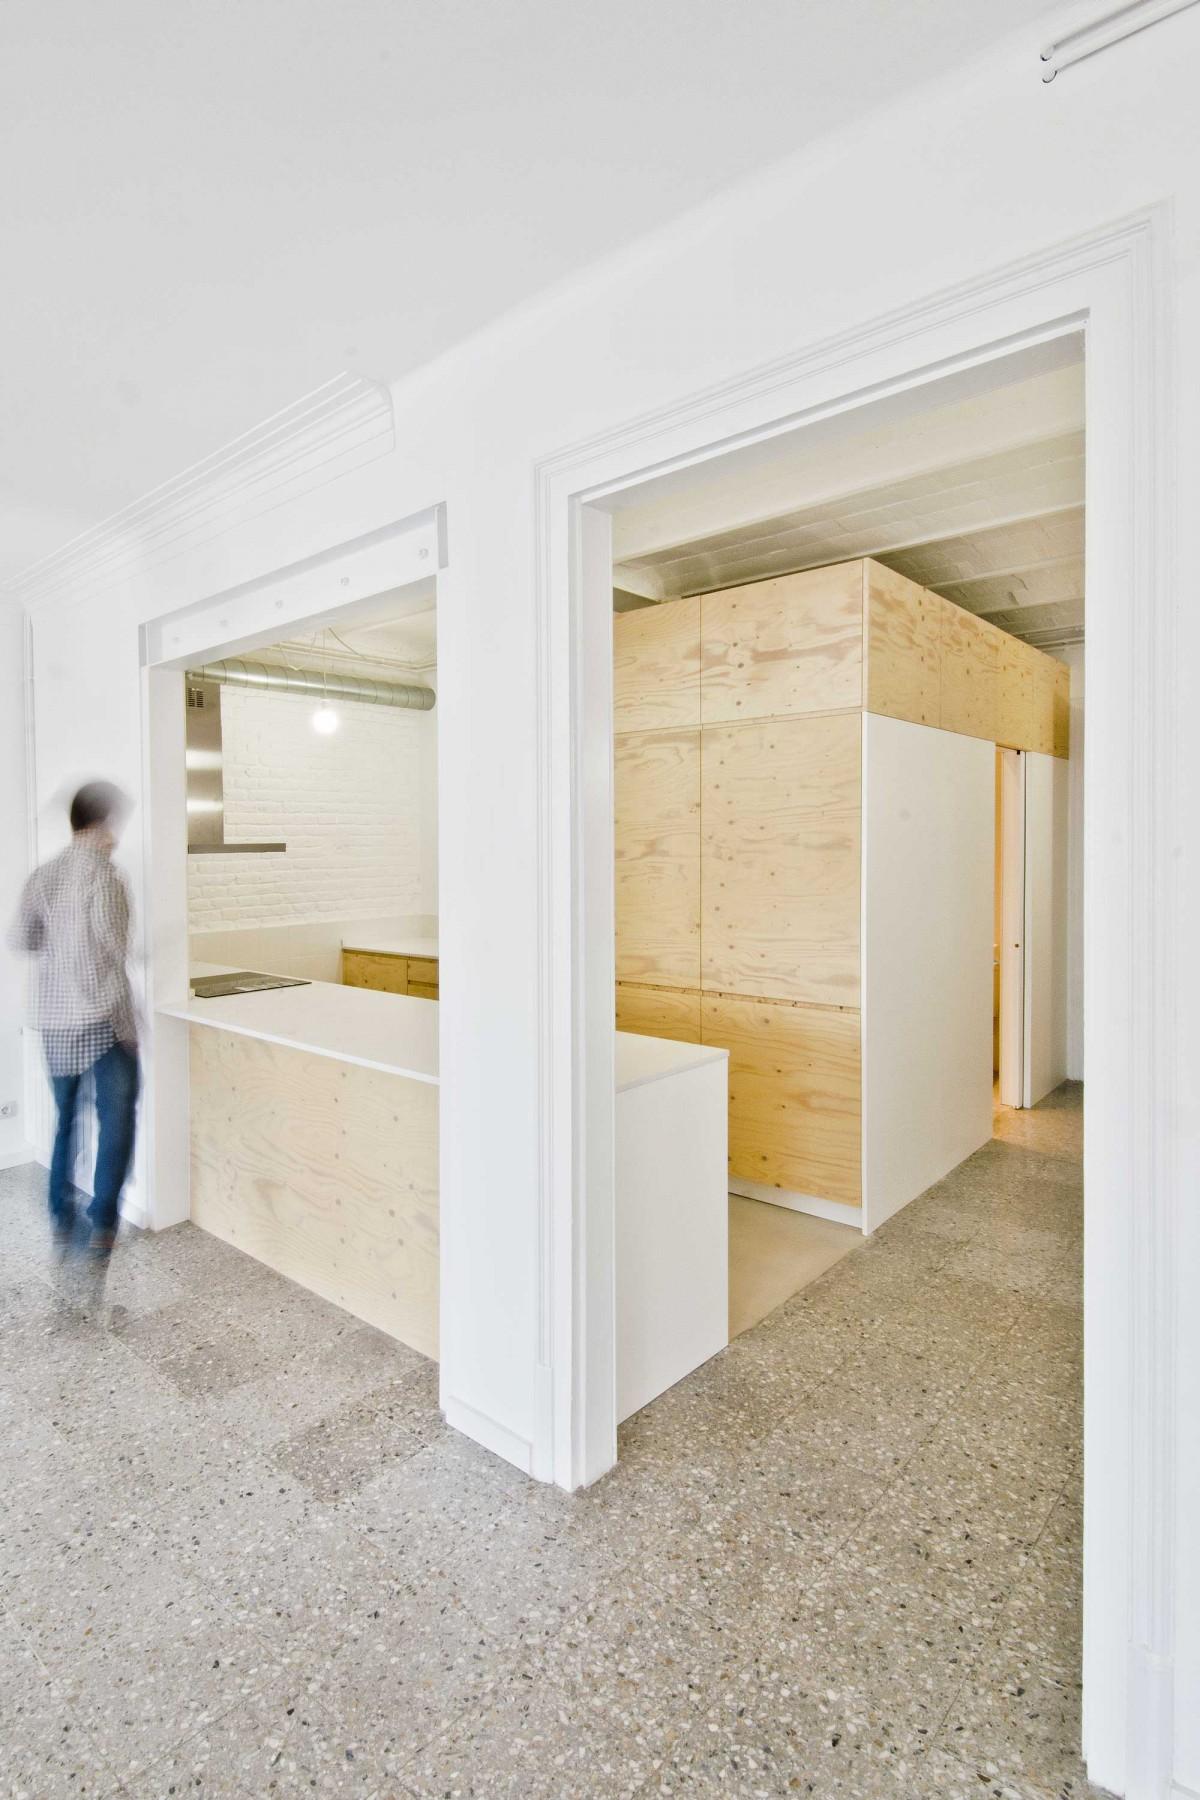 Apartment Renovation In Manhattan: Minimal Apartment Renovation In Barcelona